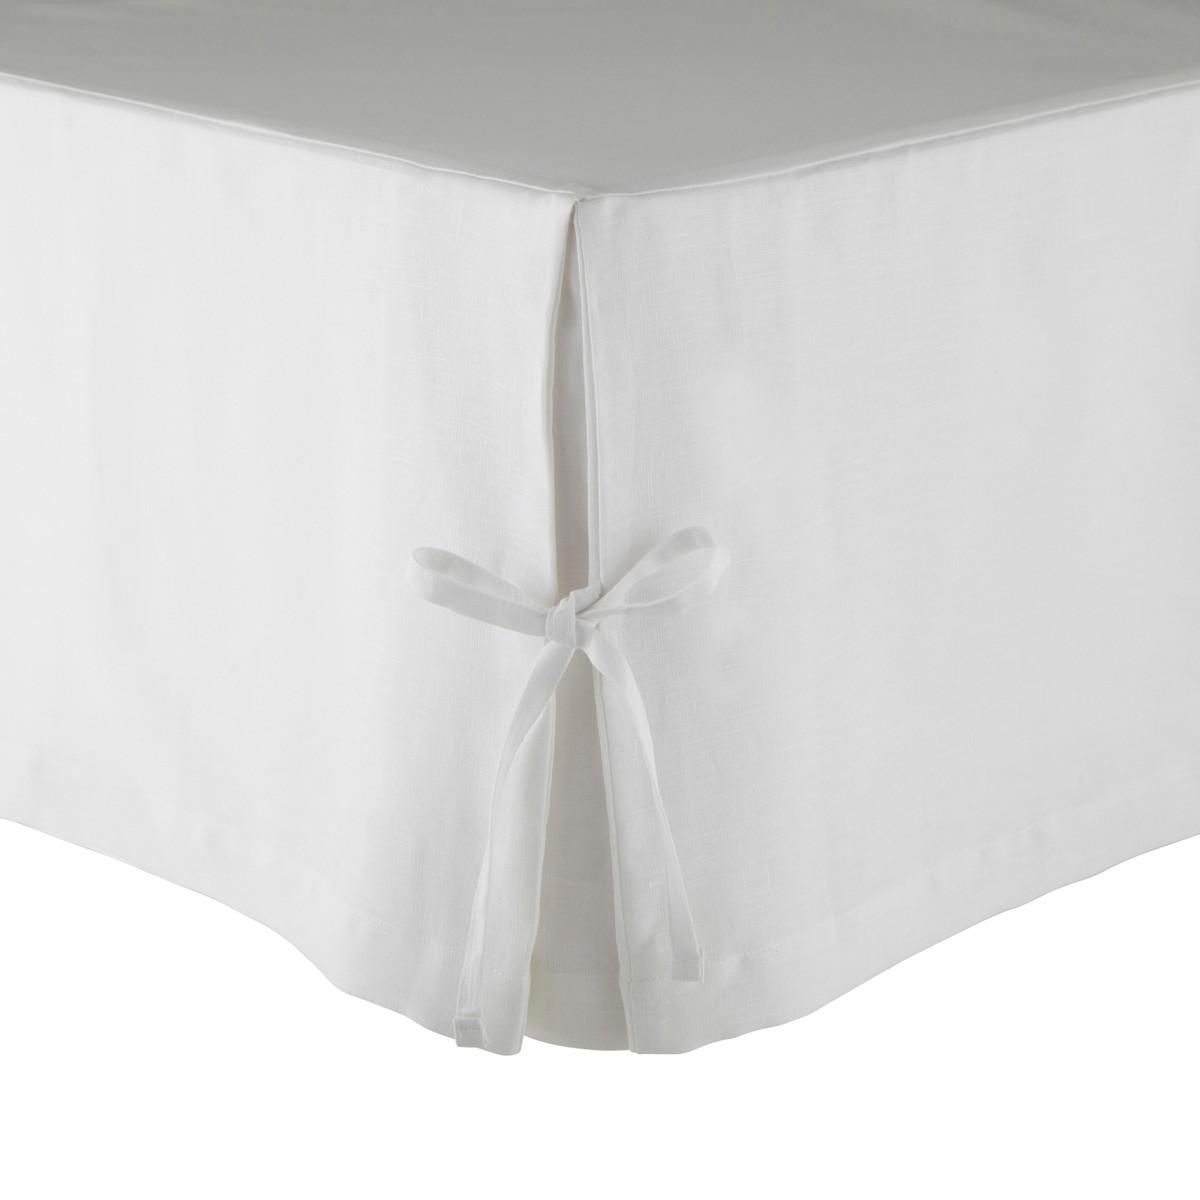 Cache sommier Lin Blanc 90 x 200 cm (photo)